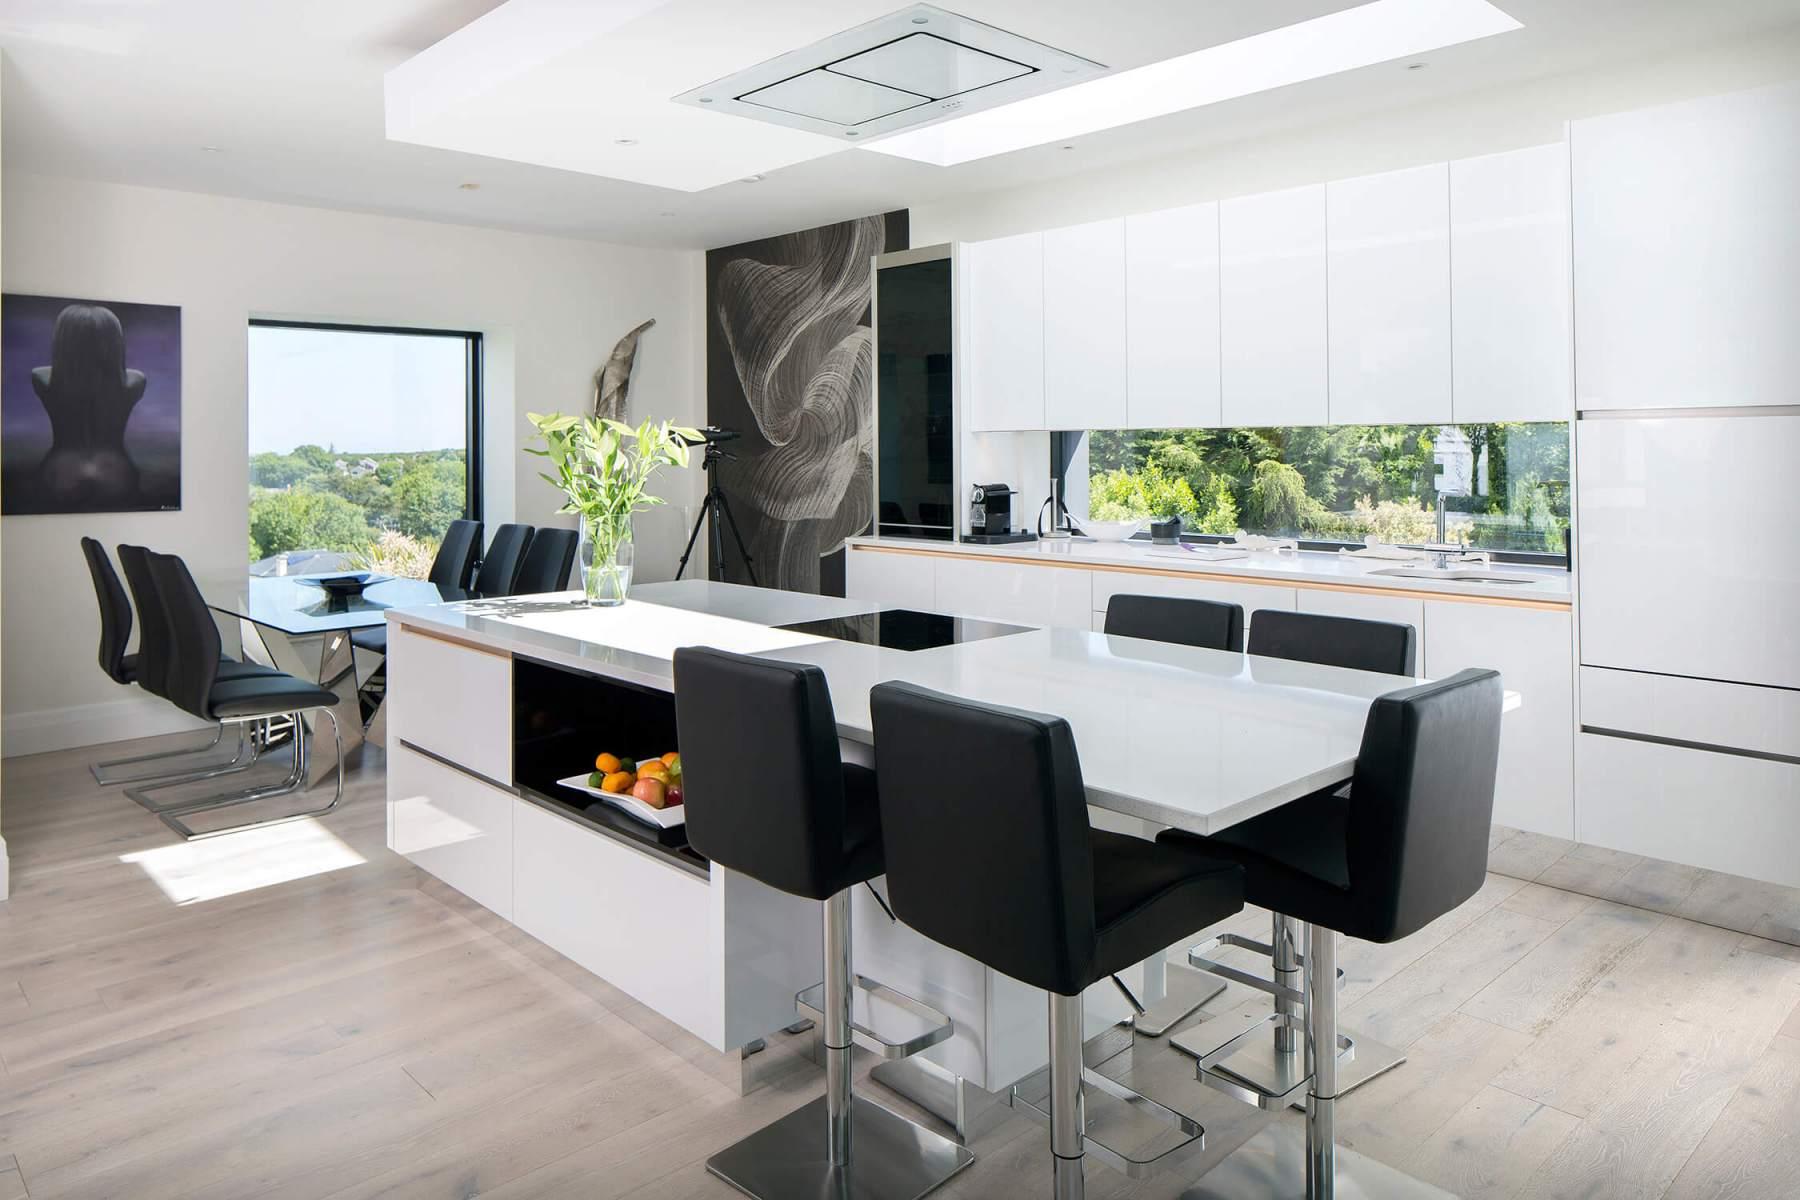 Interior-contemporary-kitchen